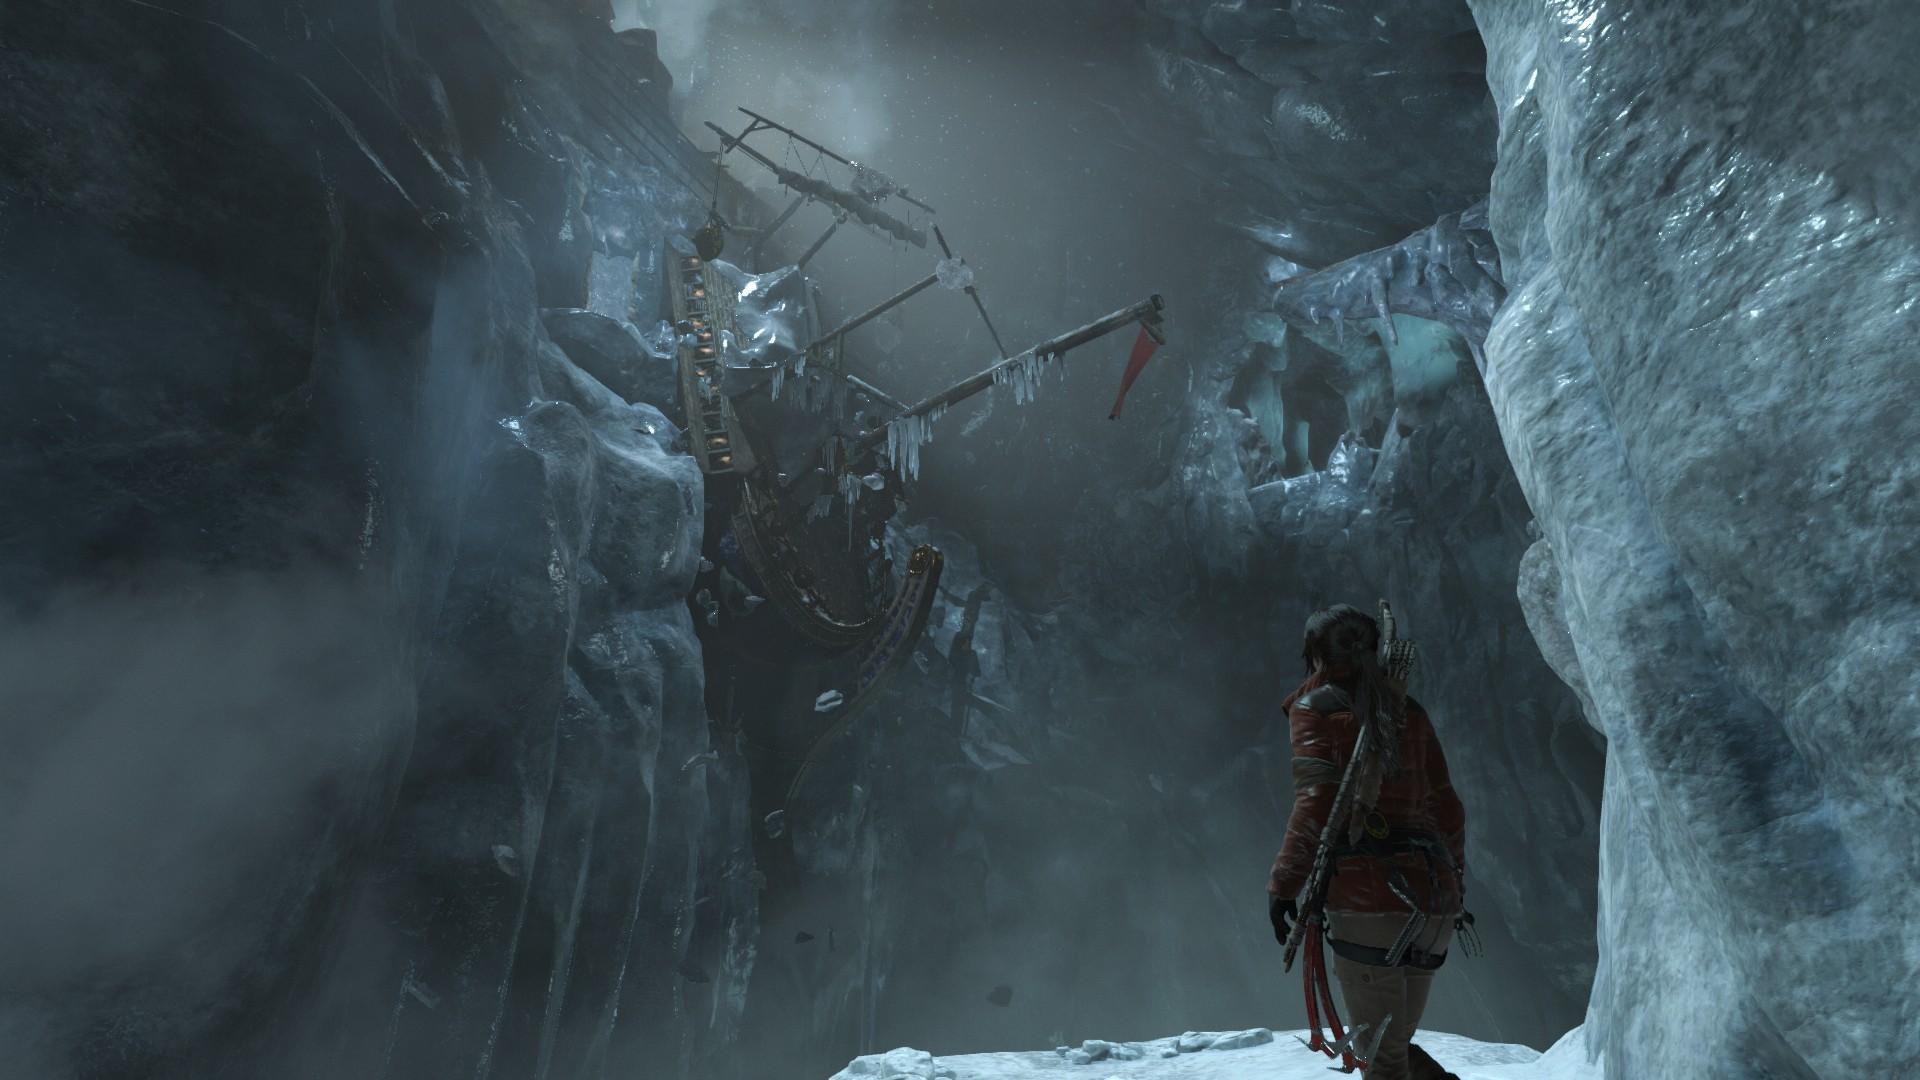 Rise Of The Tomb Raider PC Screenshots Image 18259